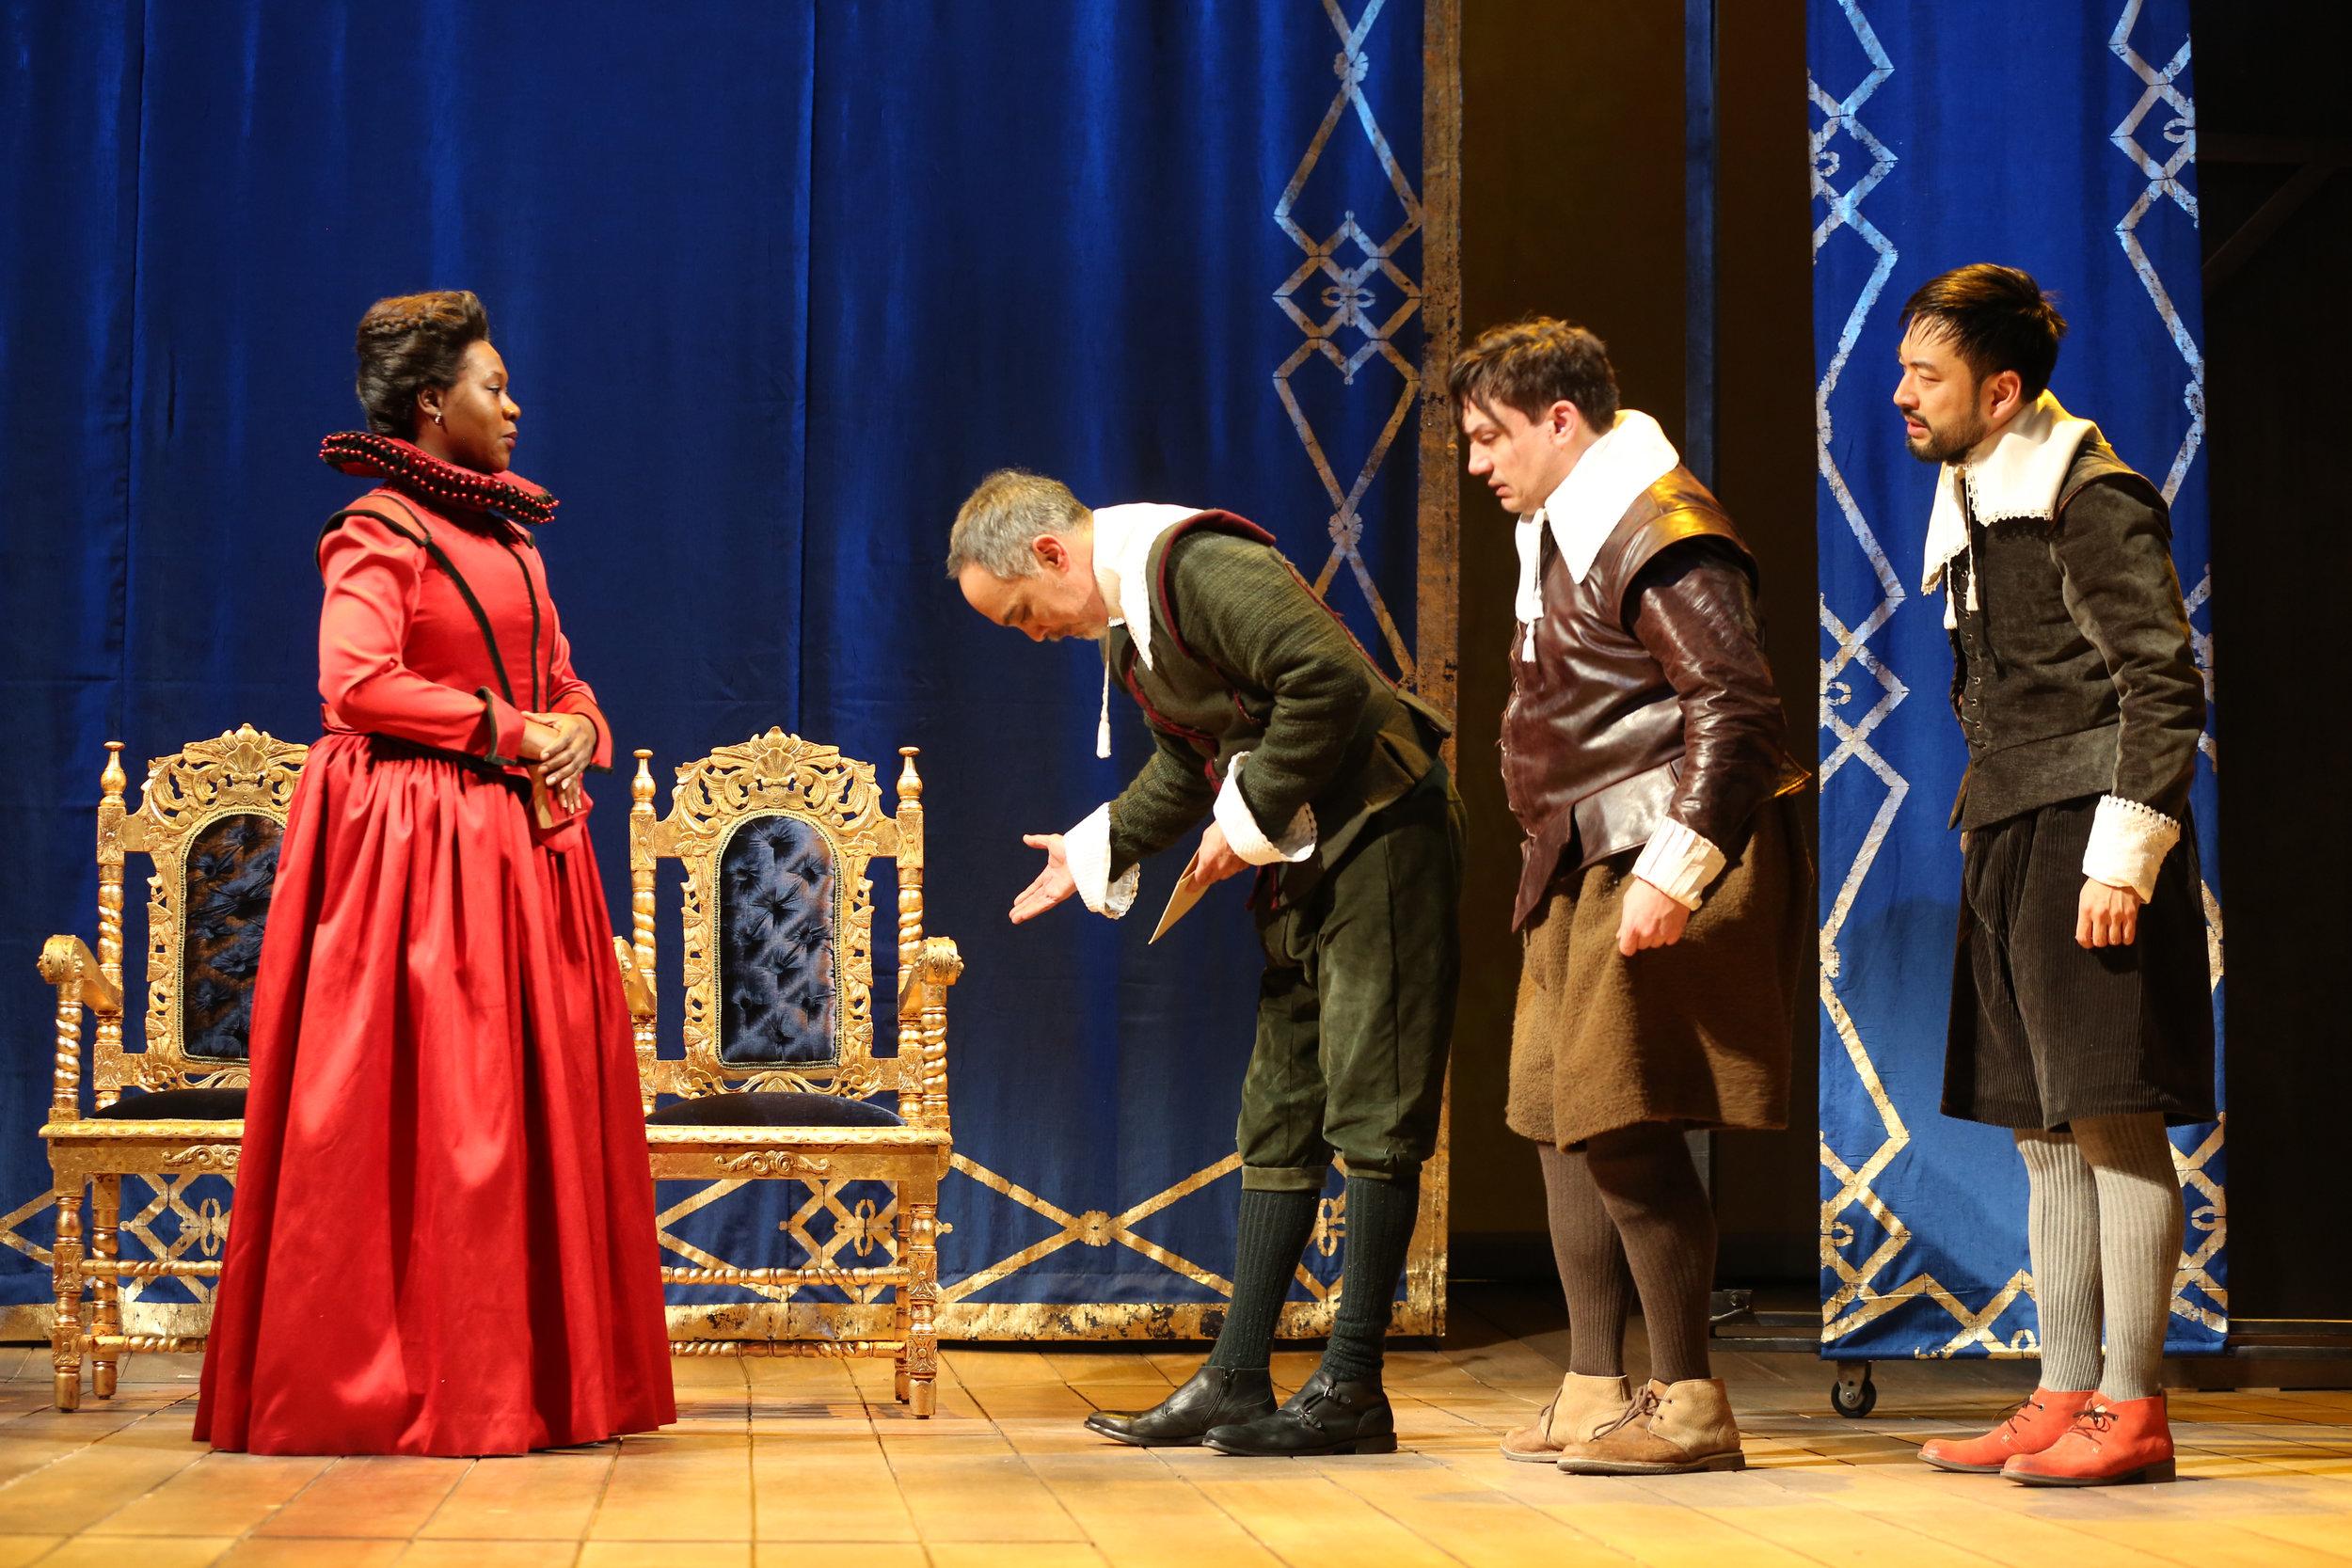 Anna Roos (Zenzi Williams), Burbage (Thom Sesma), Heminges (Christopher Ryan Grant), Shakespeare (Daisuke Tsuji) (photo: Joan Marcus)